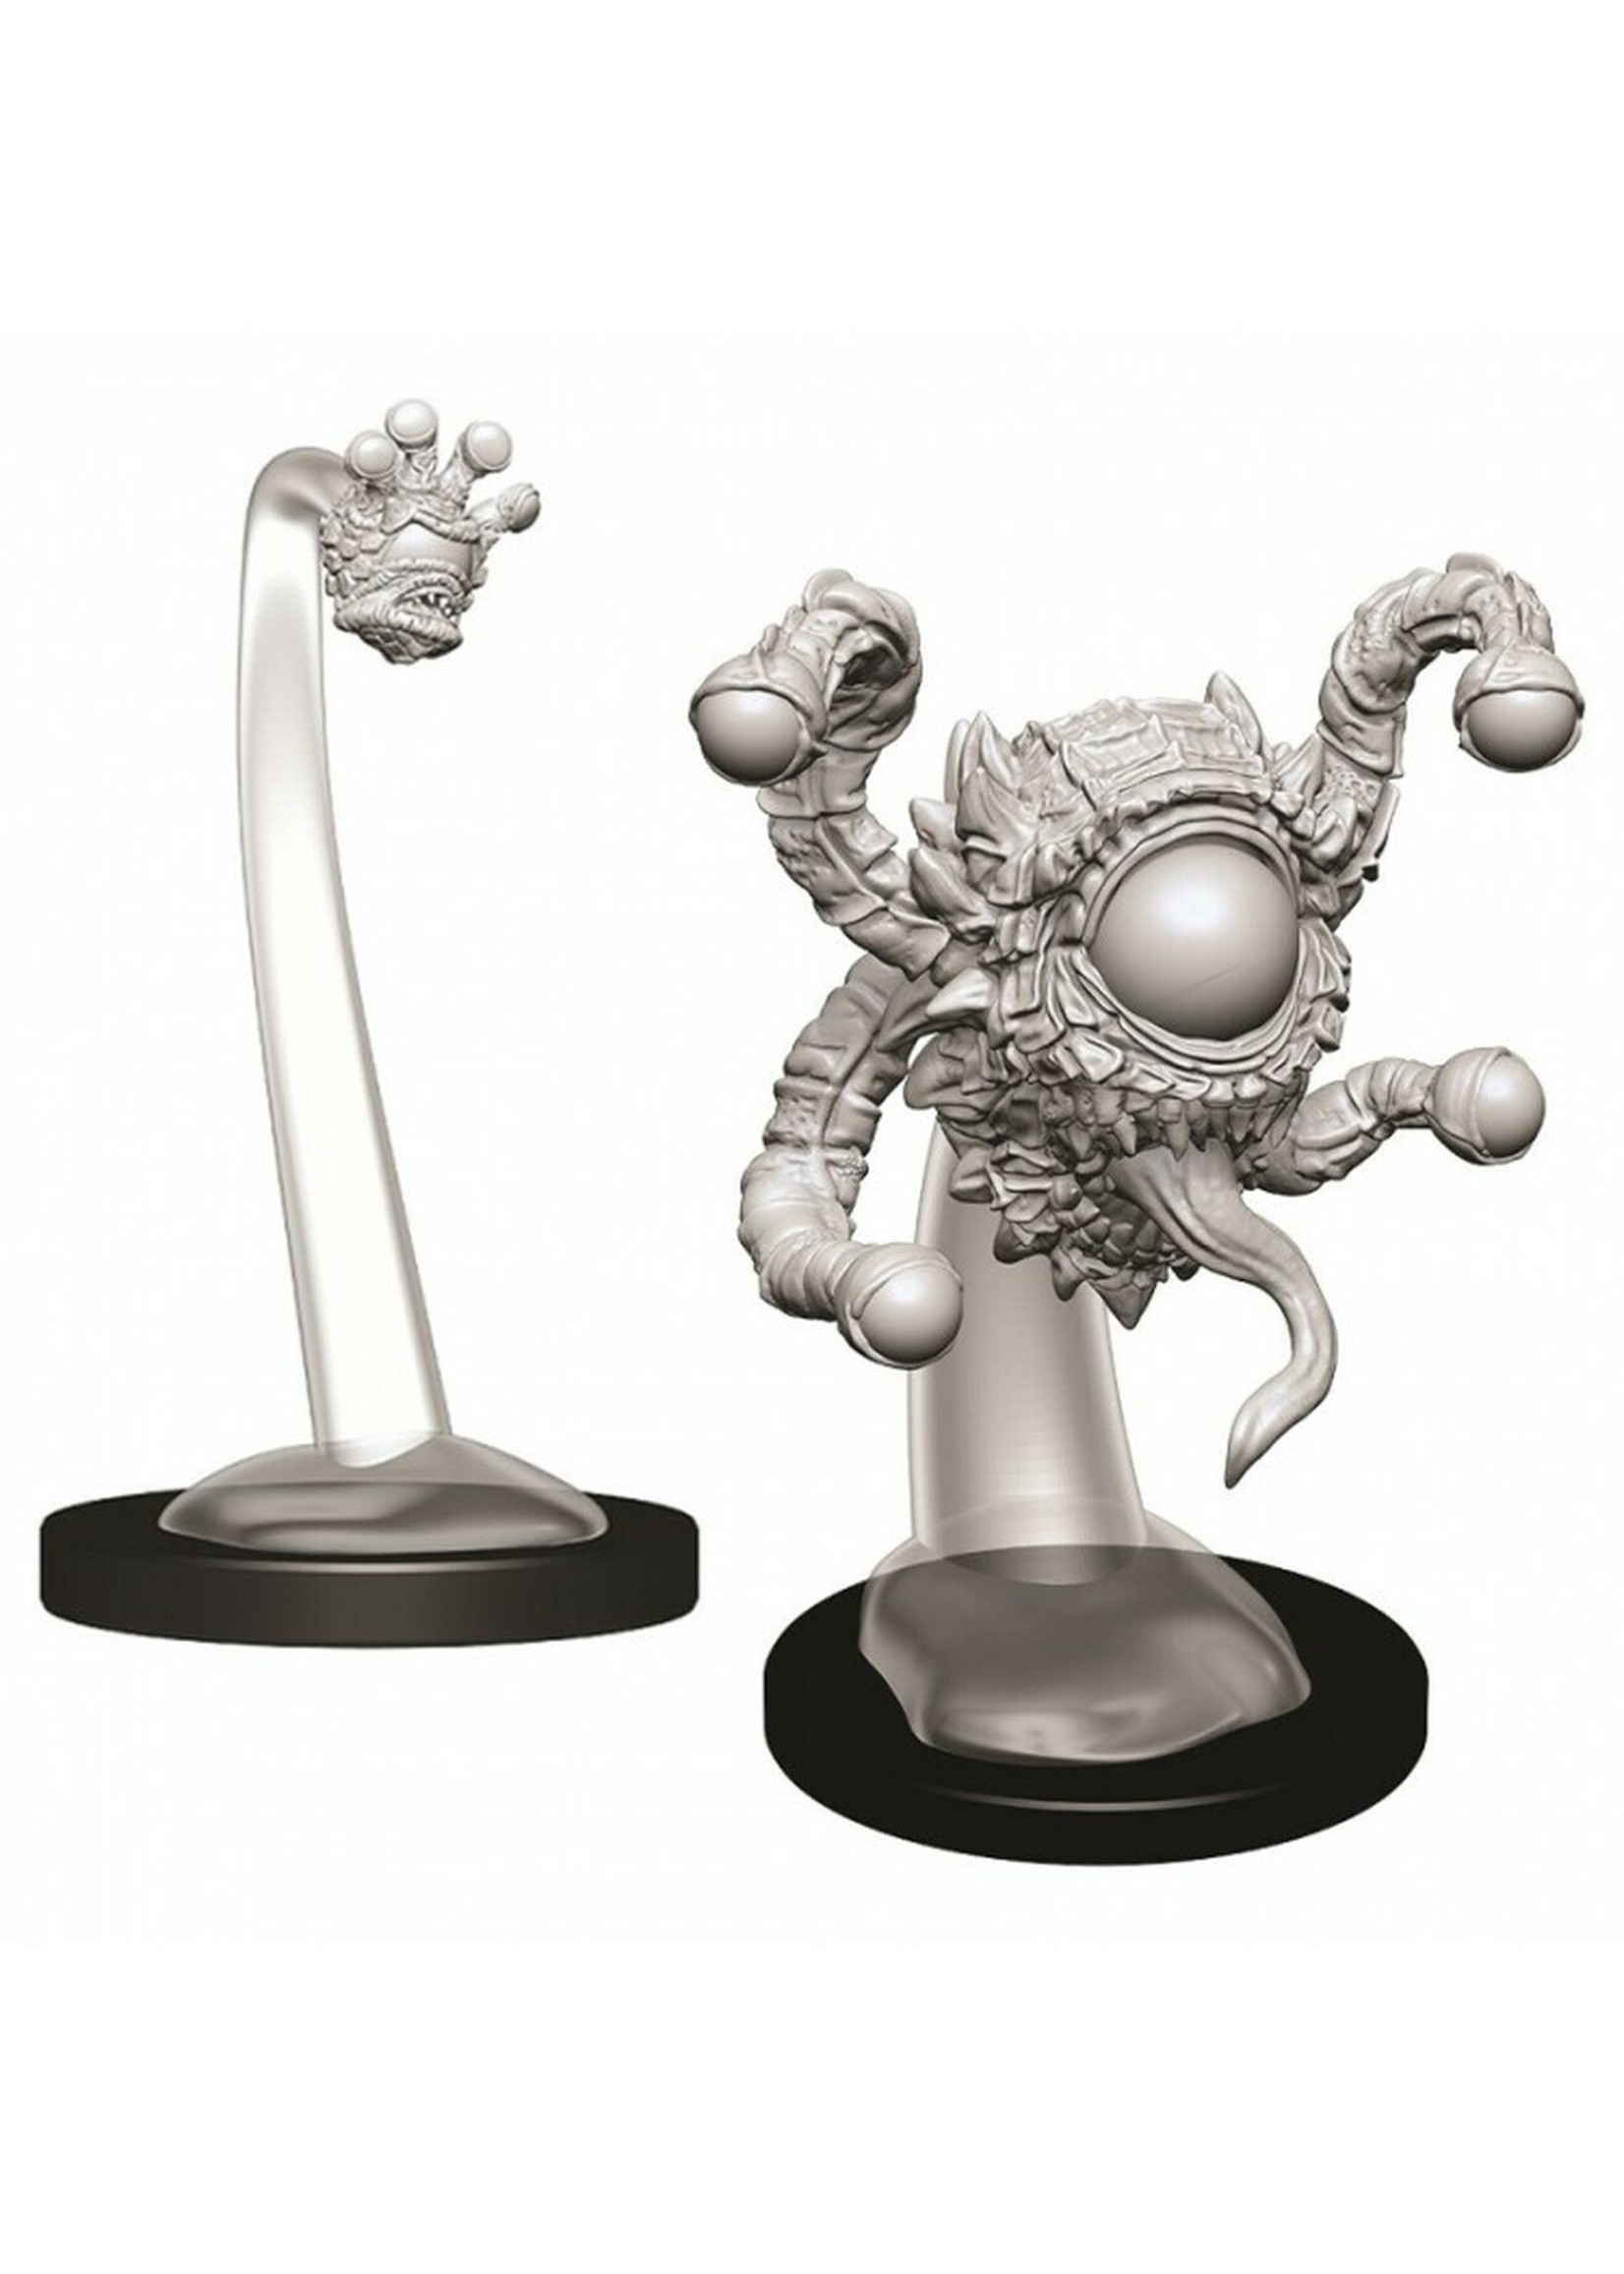 Dungeons & Dragons Nolzur`s Marvelous Unpainted Miniatures: W9 Spectator & Gazers